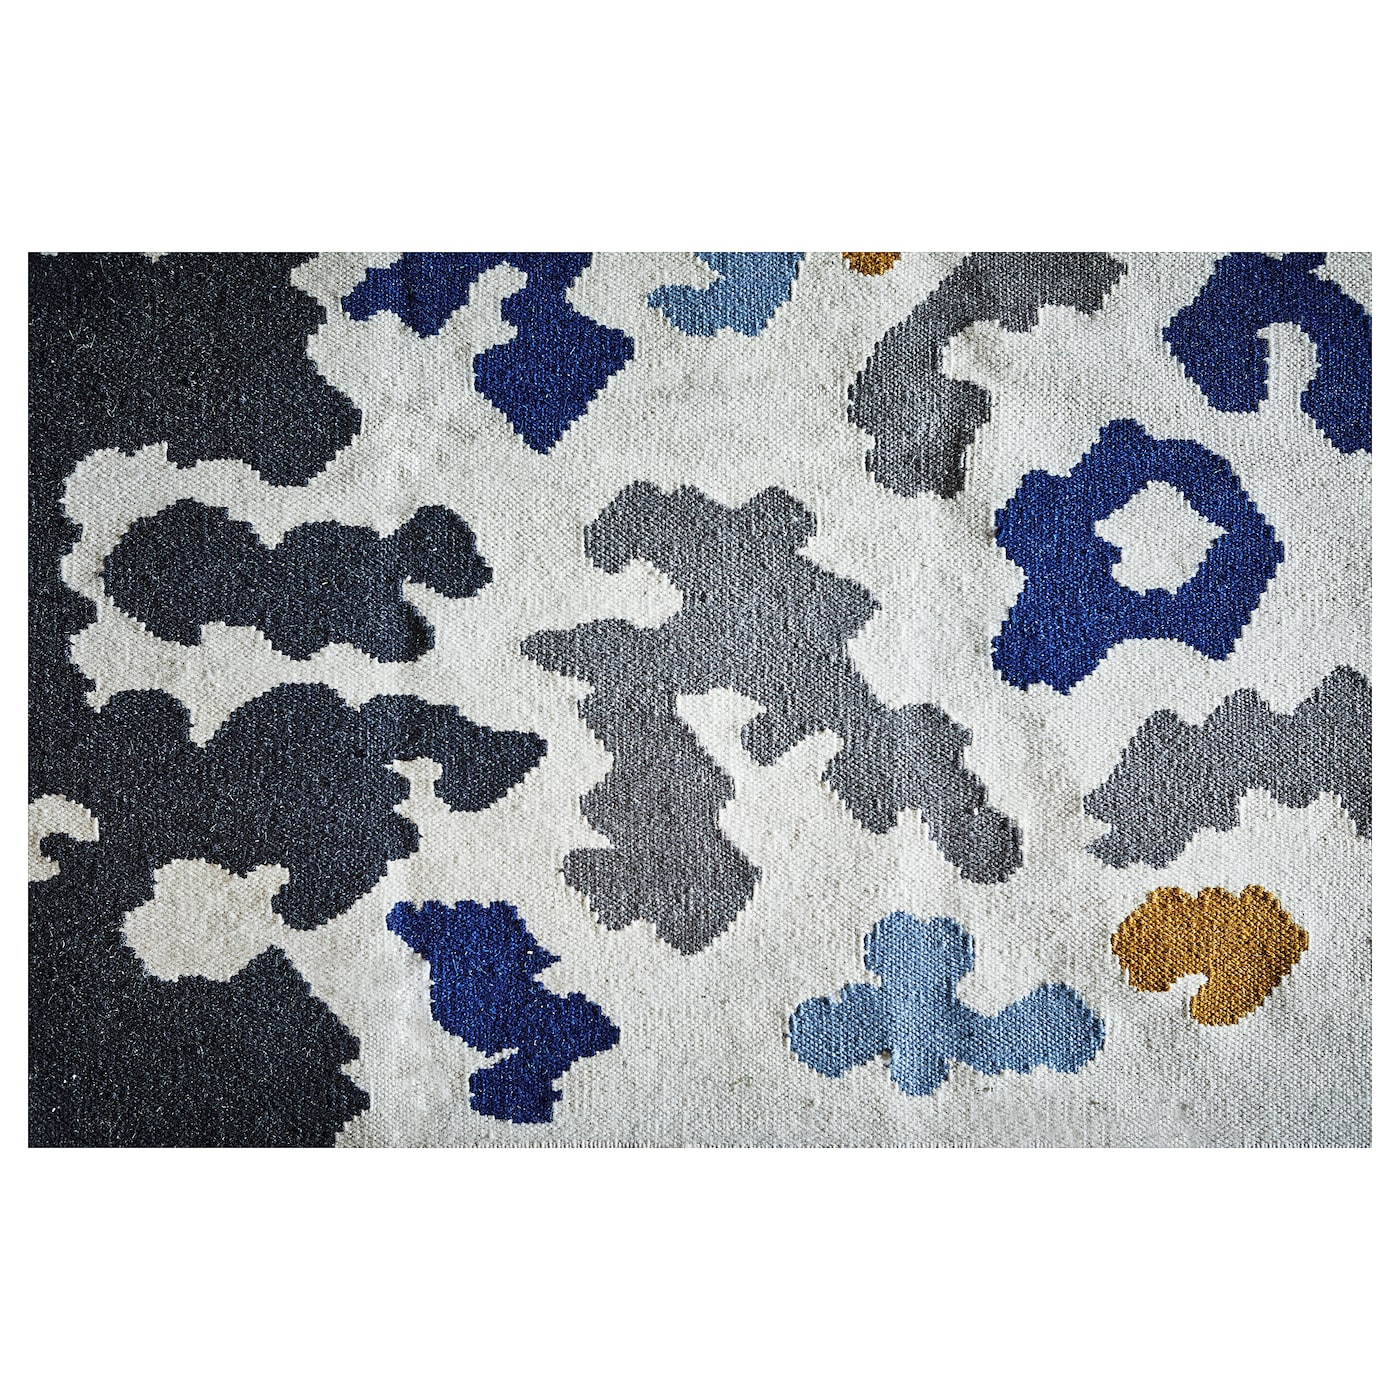 videb k tapis tiss plat fait main multicolore 133 x 195 cm ikea. Black Bedroom Furniture Sets. Home Design Ideas